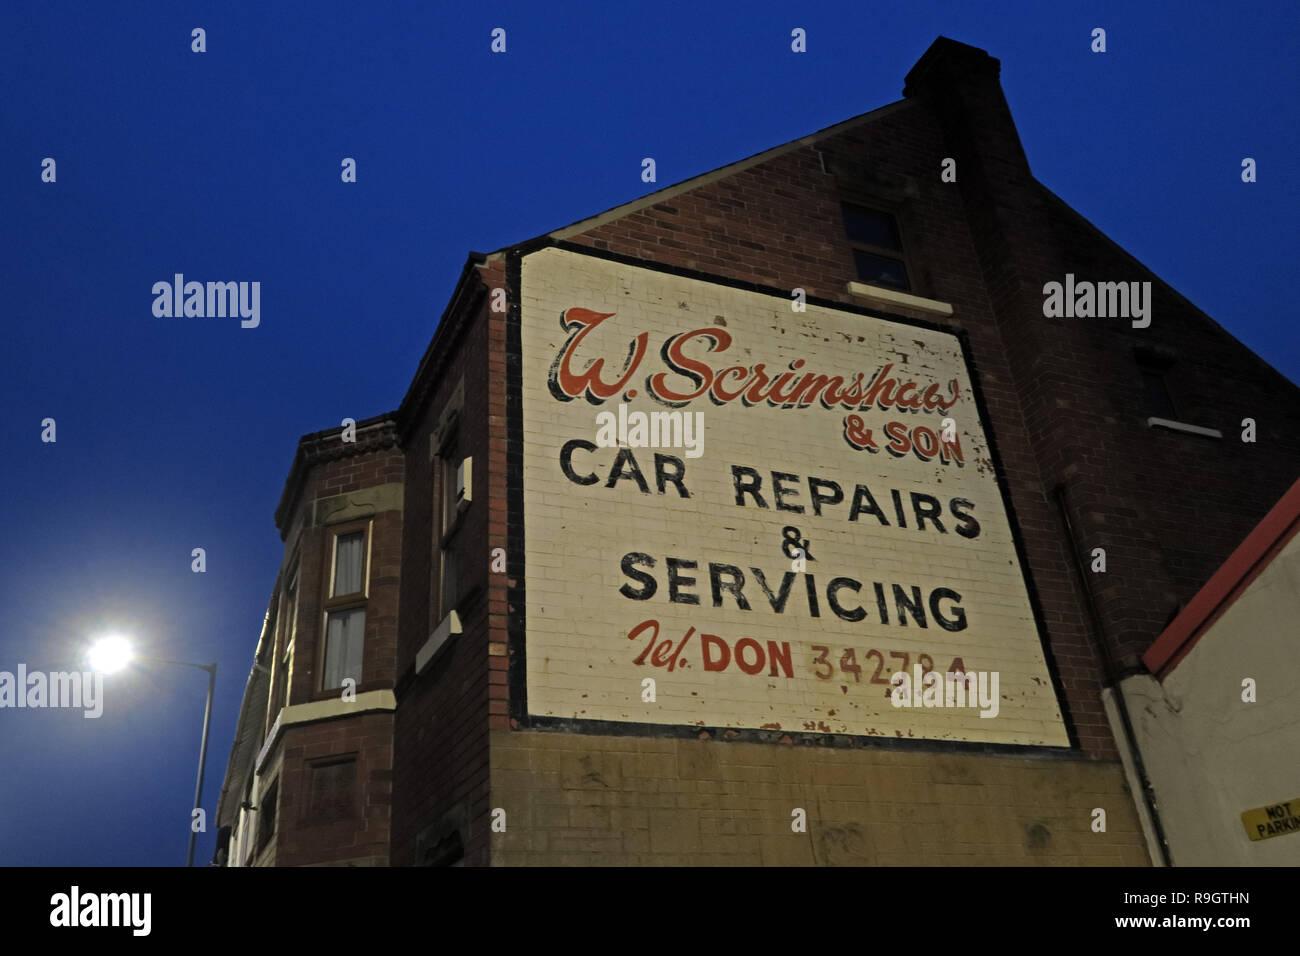 GoTonySmith,@HotpixUK,HotpixUK,night,sign,painted,on,gable-end,gableend,moon,dusk,Car